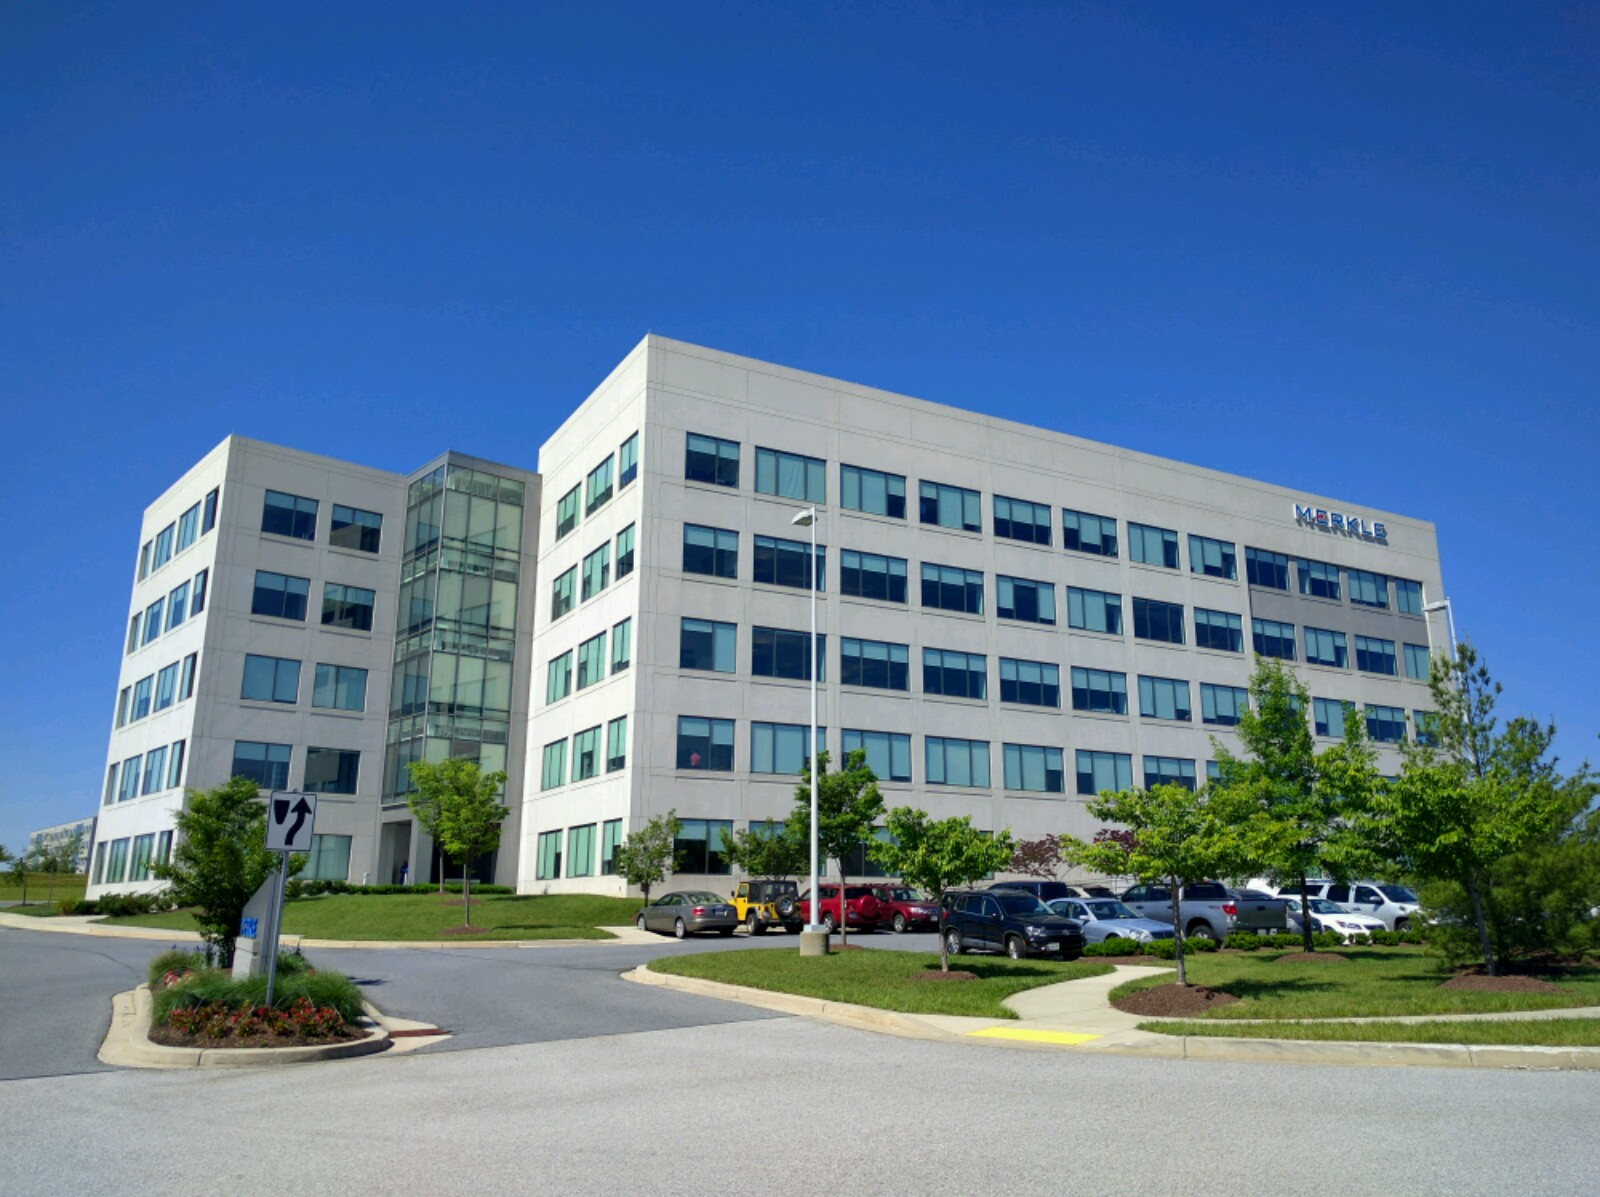 Merkle's corporate headquarters in Columbia, Maryland.